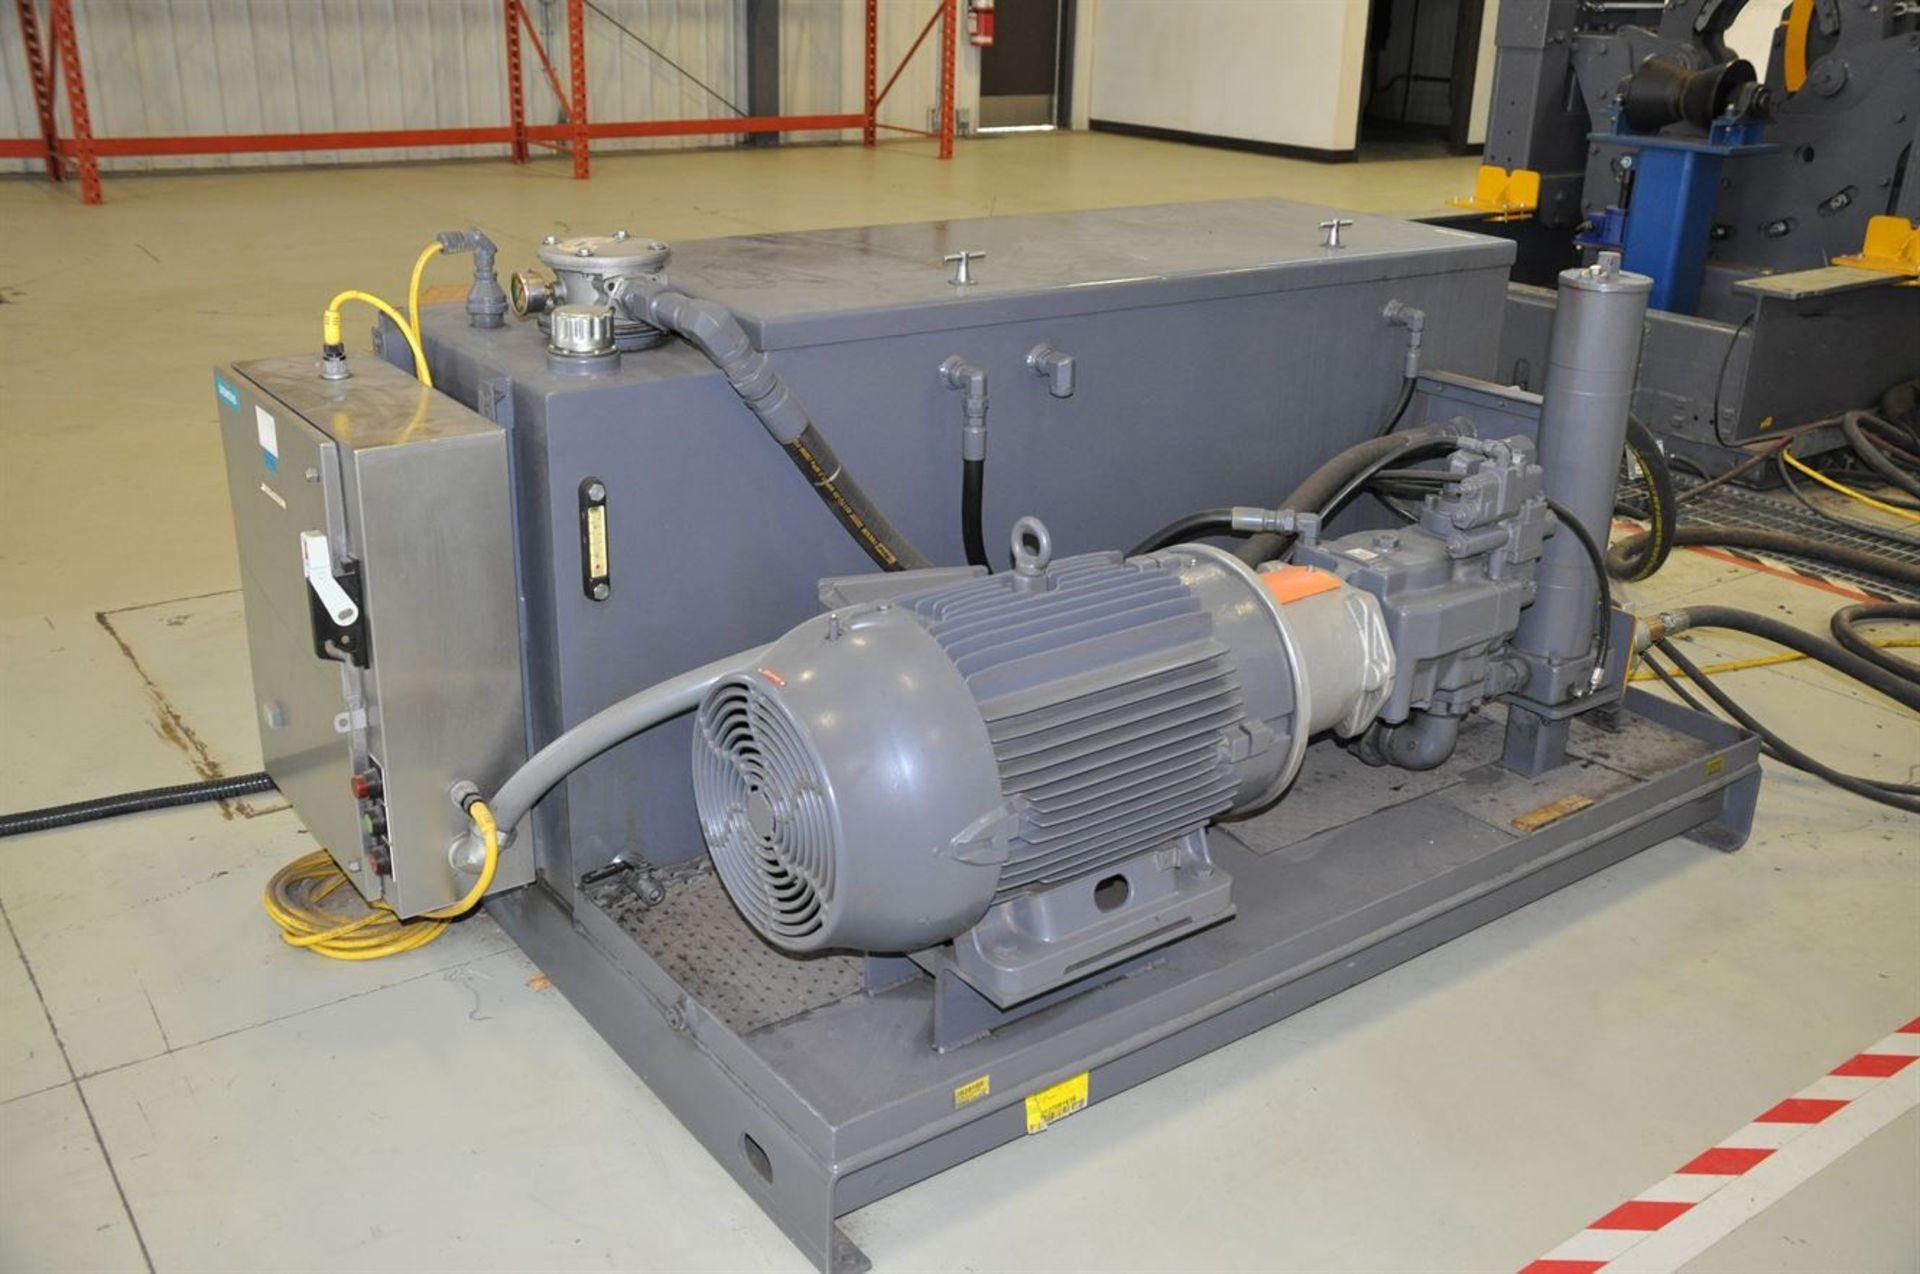 "2012 McCOY CLEBU 1500 15"" Type III Bucking Unit, s/n 8988, w/ PLC Control, Size Range: 15"" – 2. - Image 4 of 6"